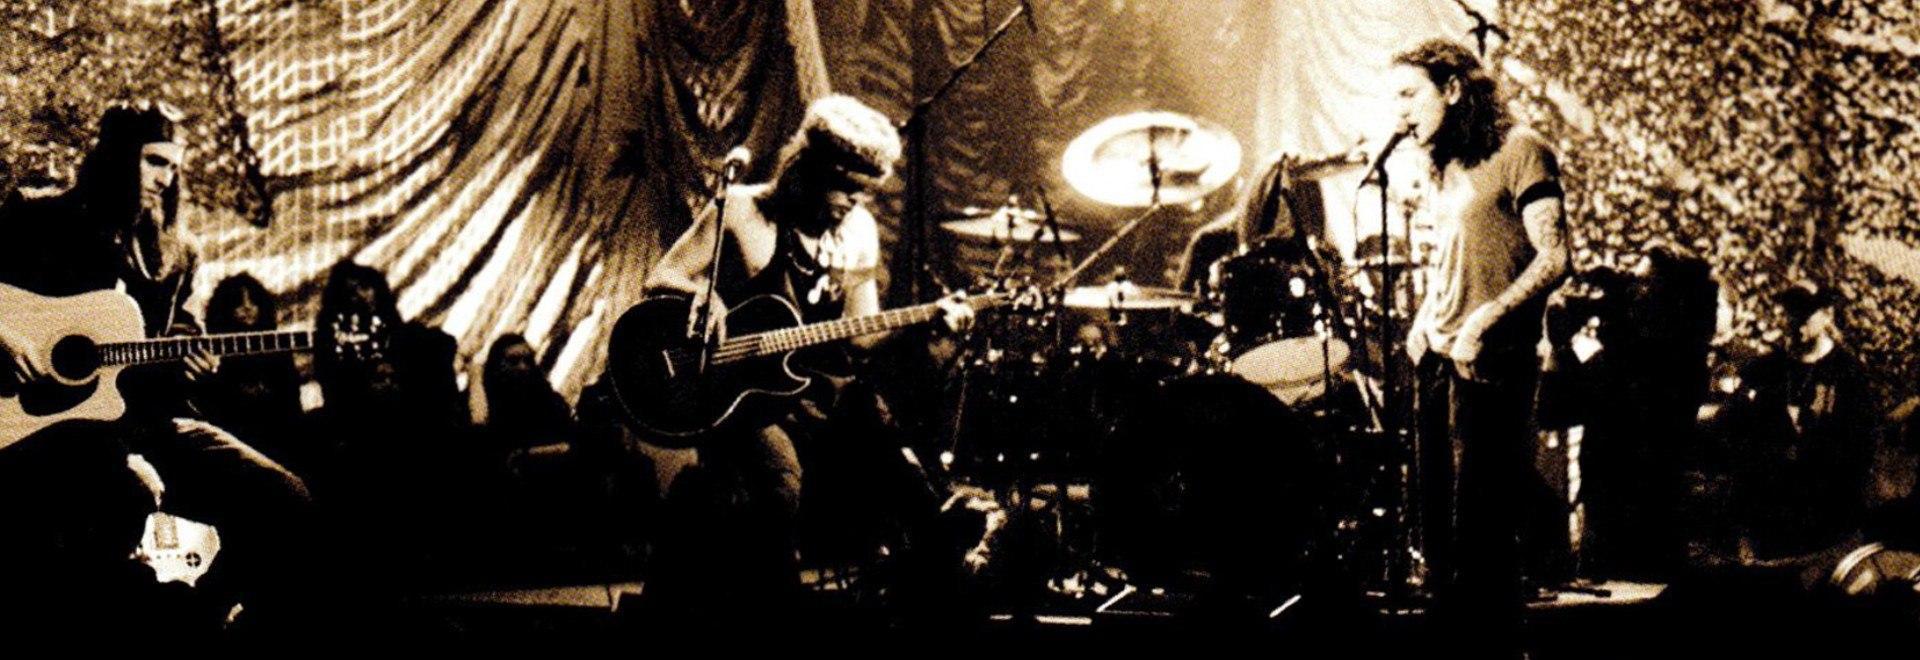 Unplugged Pearl Jam